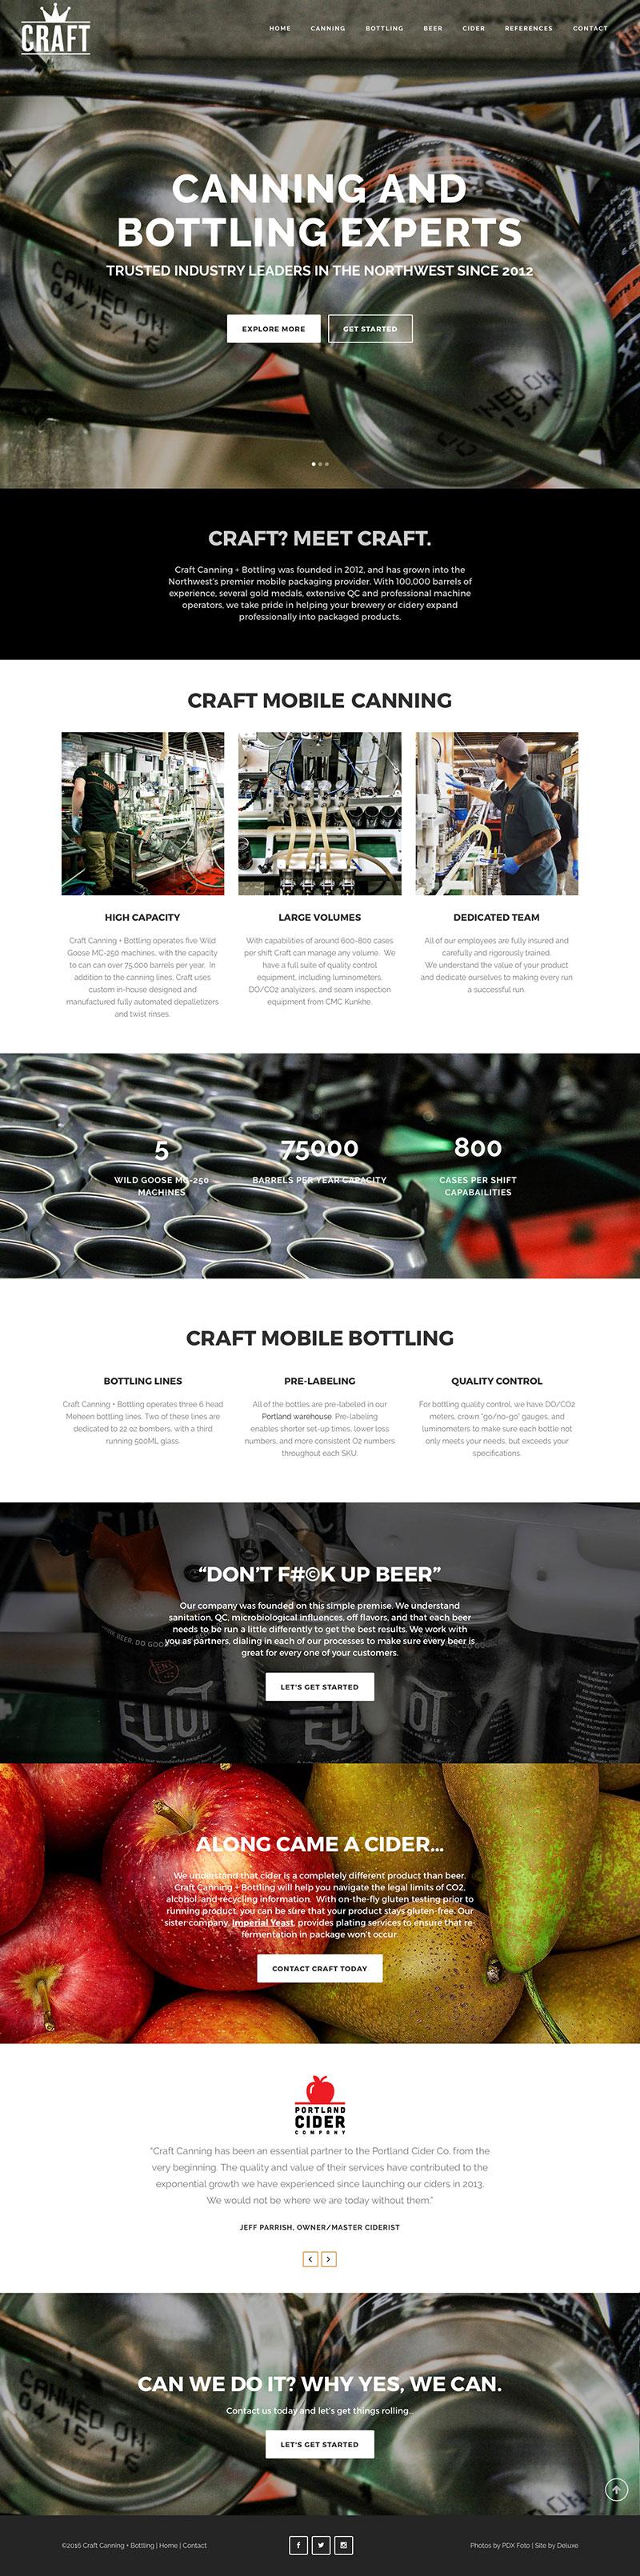 craft_canning_website_2016_blog